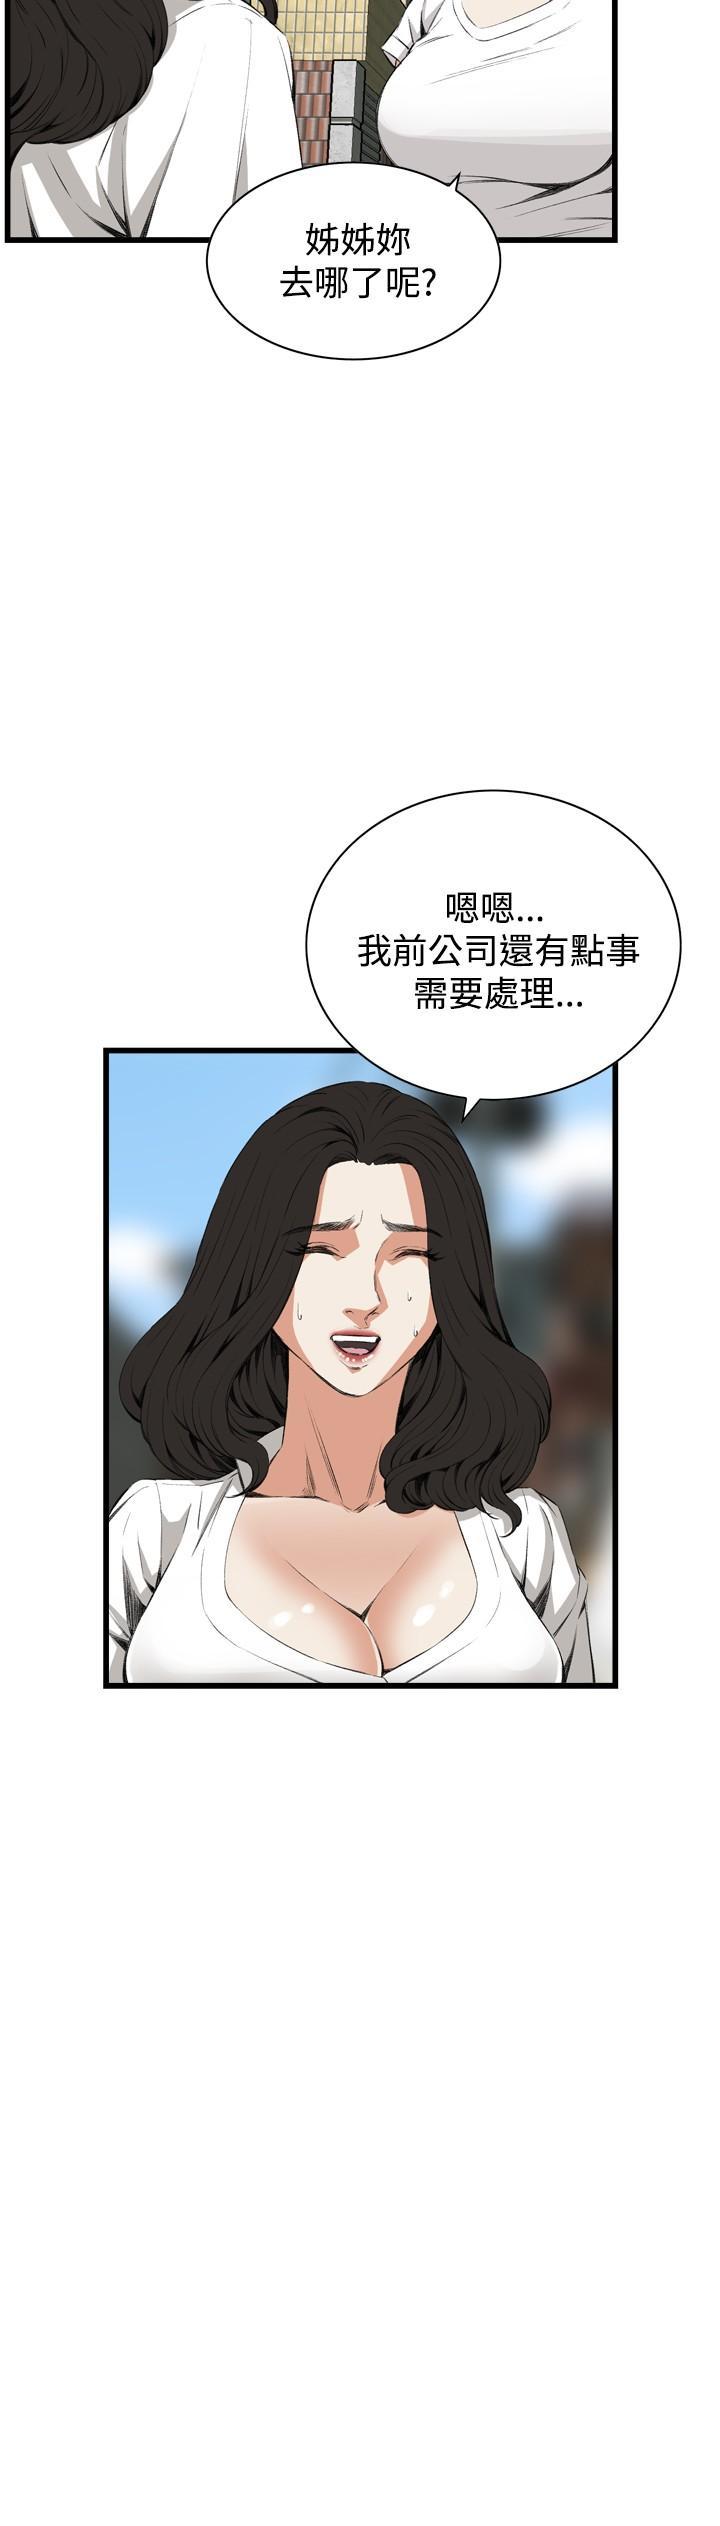 Take a Peek 偷窥 Ch.39~55 [Chinese]中文 380